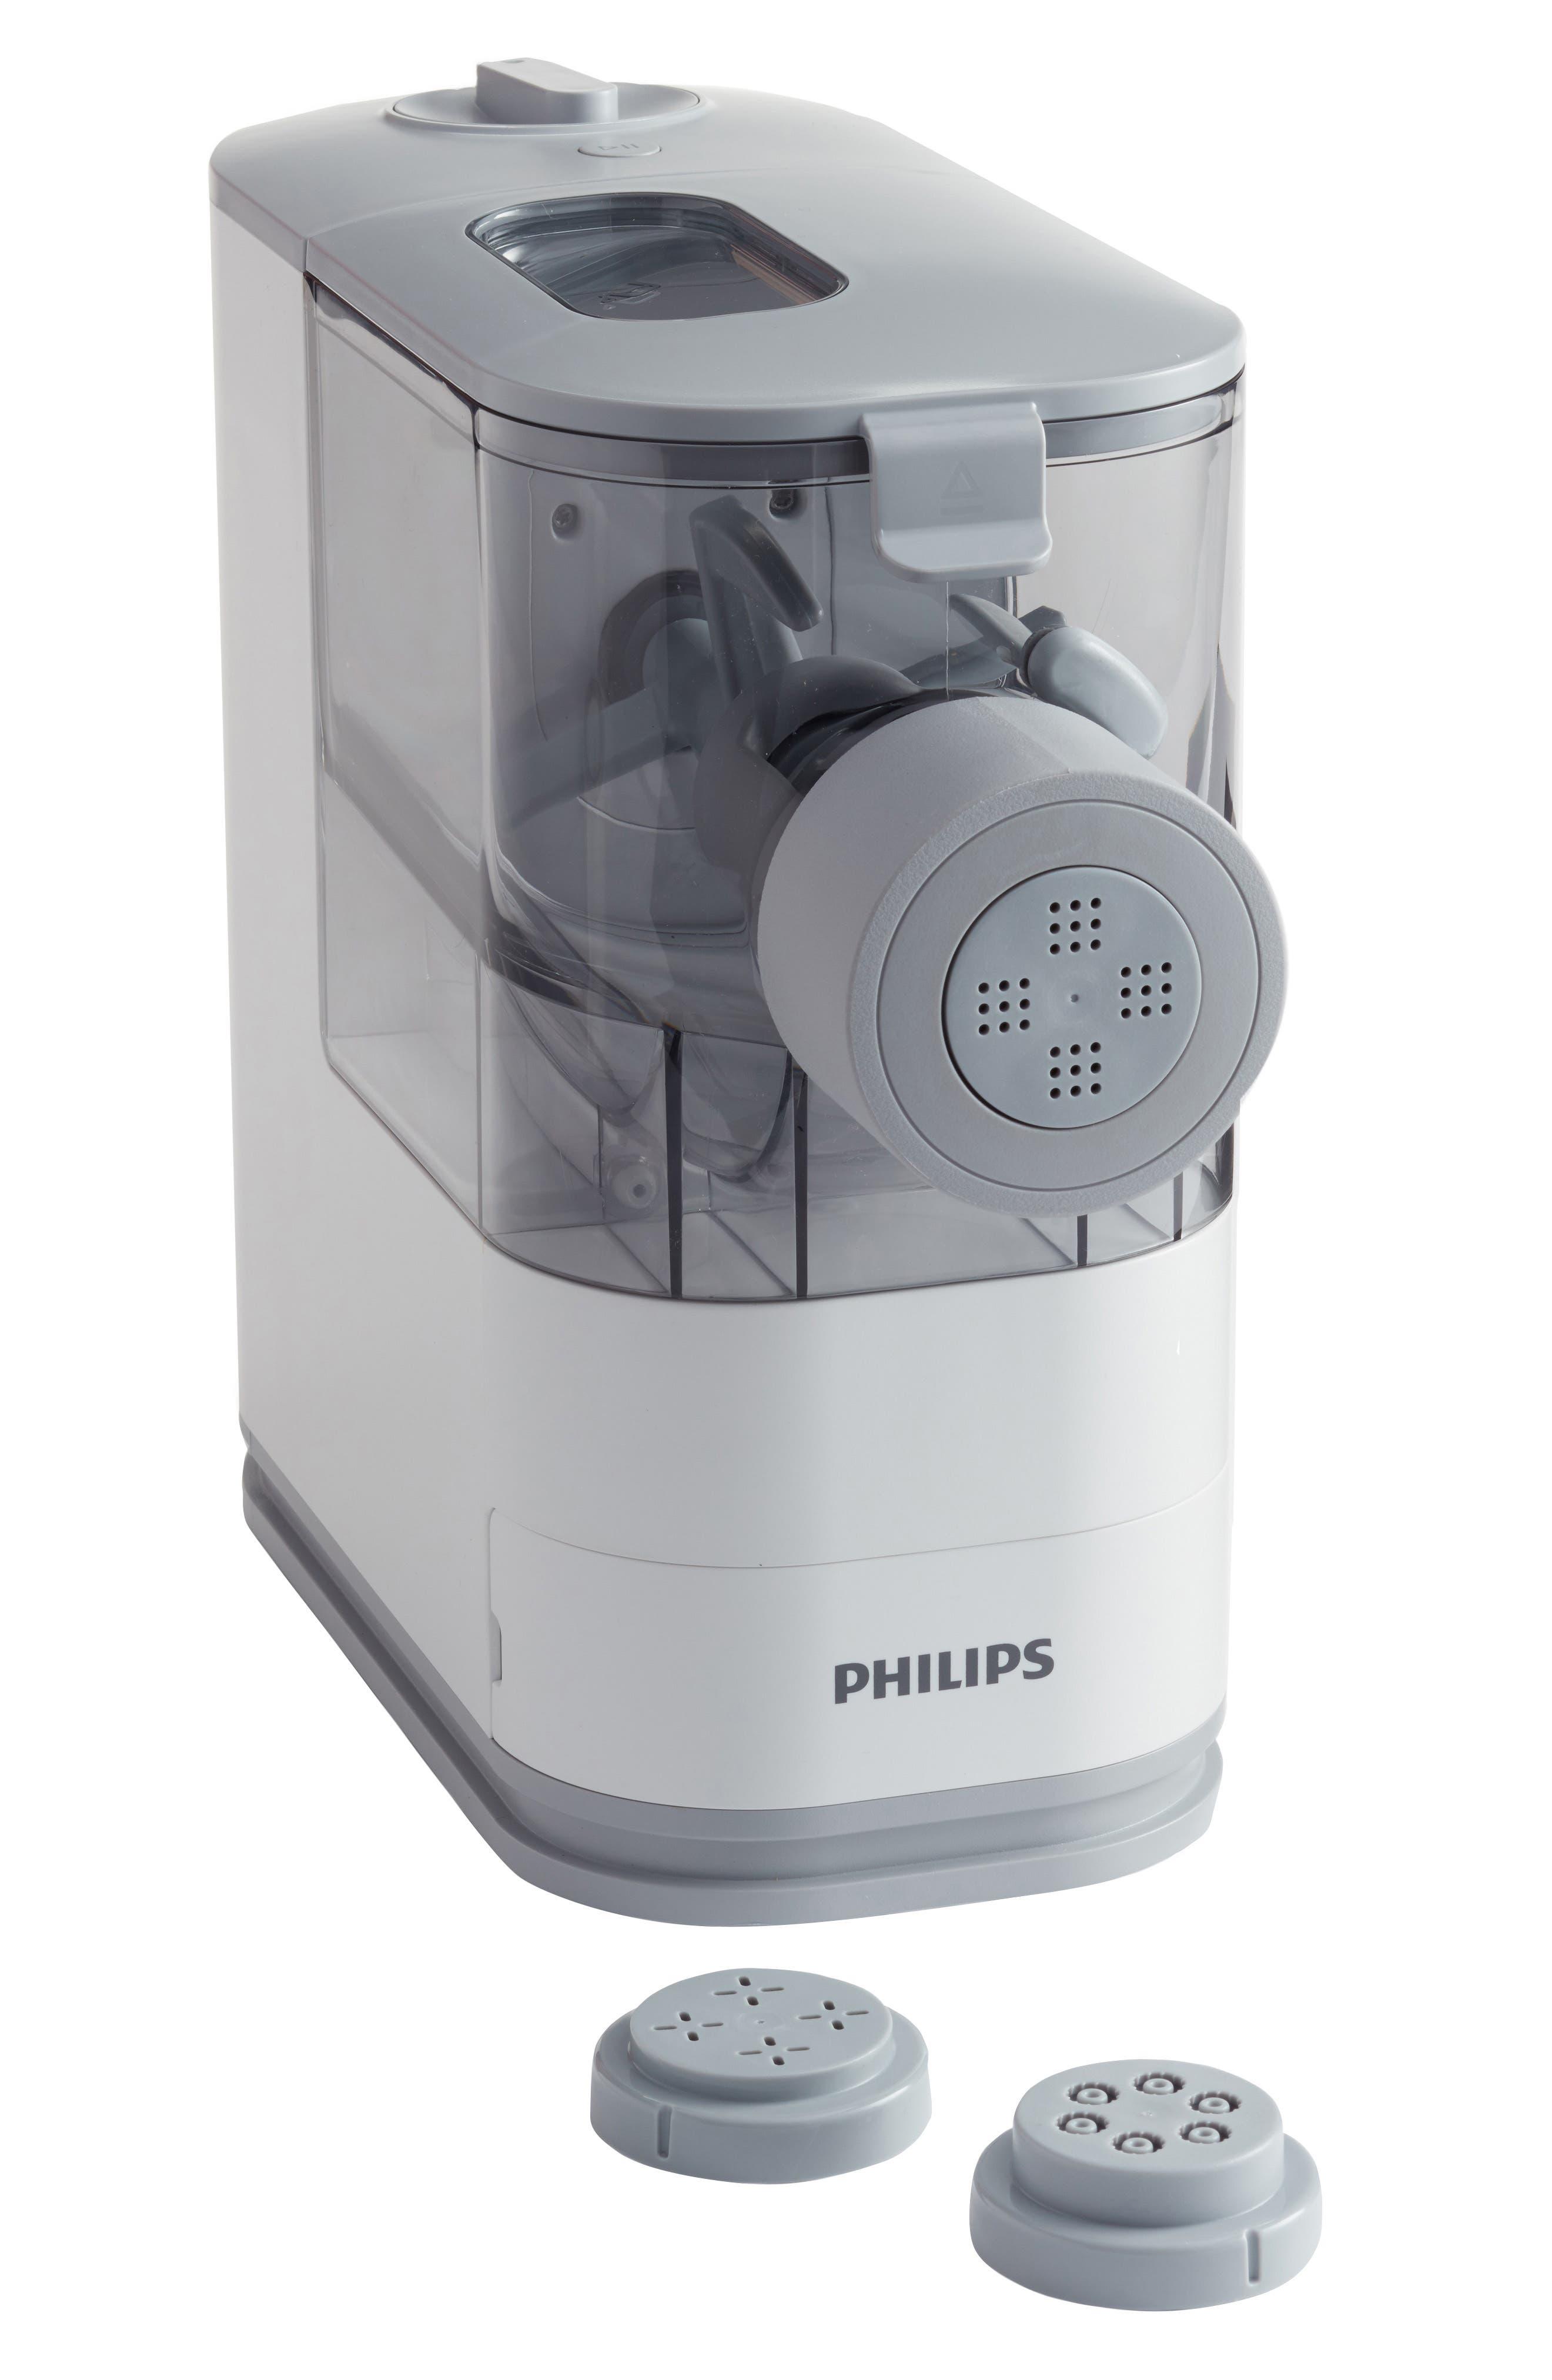 Philips Viva Compact Pasta Maker